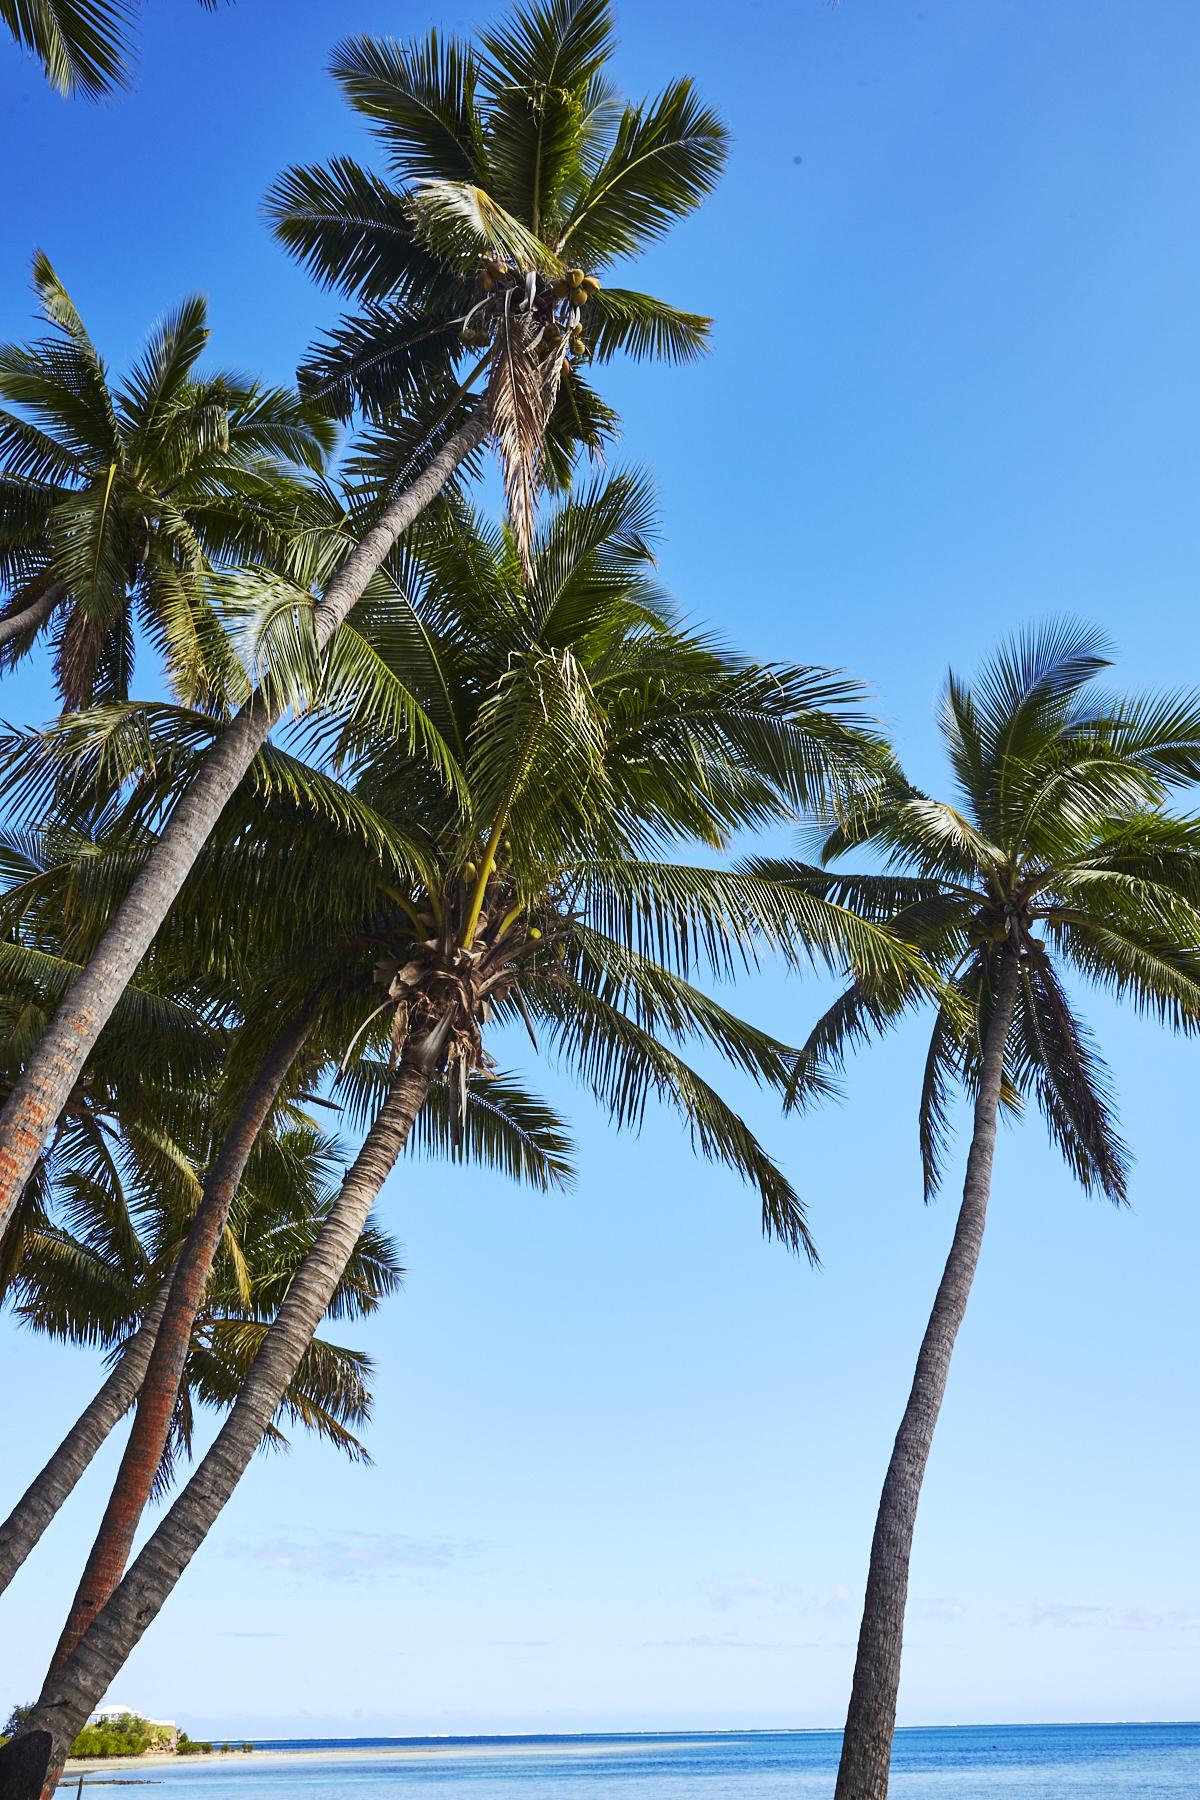 Tropica Island Resort, Malolo Island, Fiji